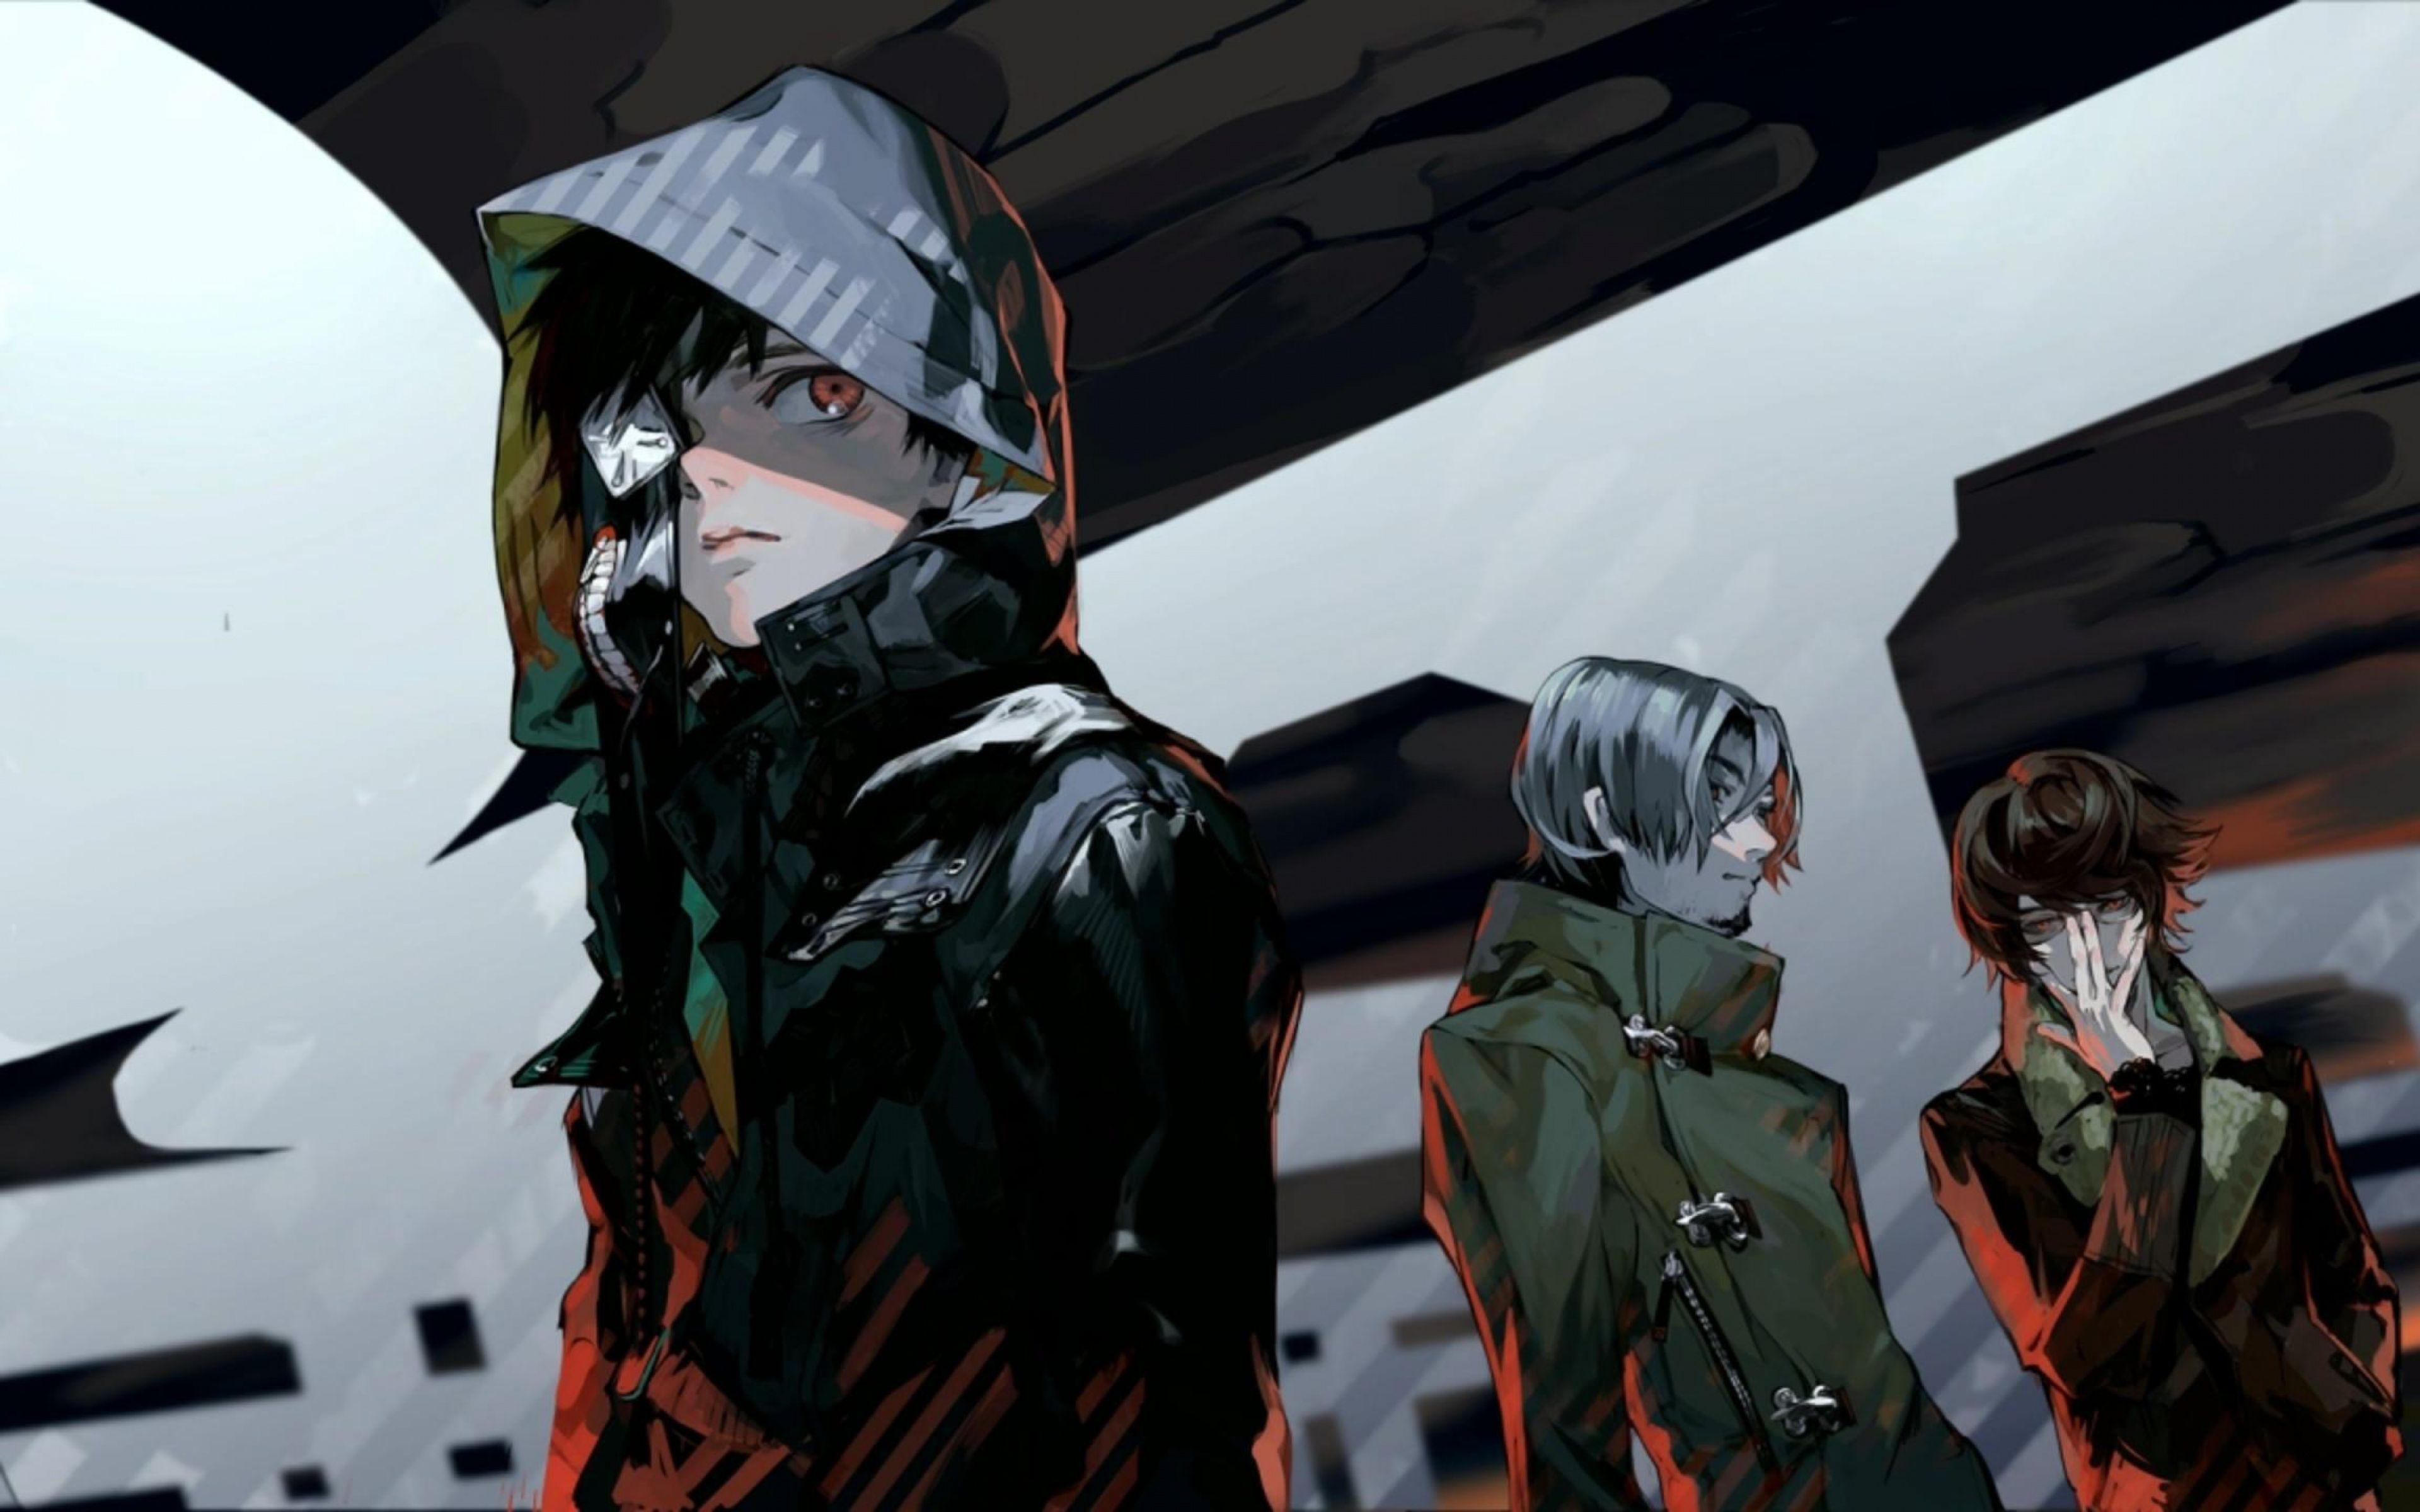 Download Wallpaper 3840x2400 Tokyo ghoul, Kaneki ken, Guys, Art Ultra HD 4K HD Background